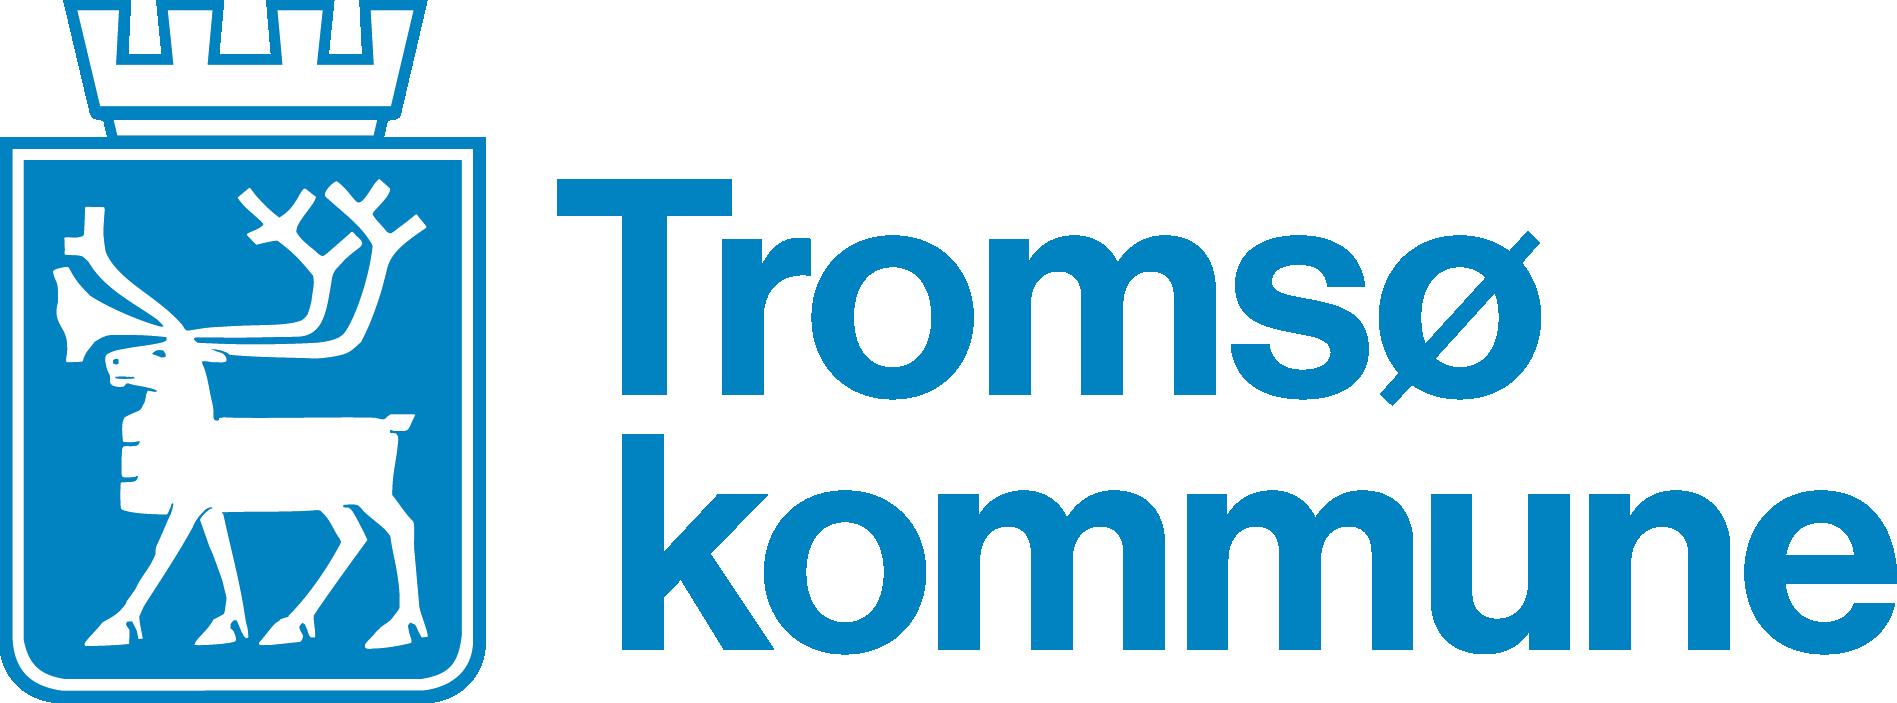 TromsoKommune_HOVEDLOGO_FARGE_transp.png